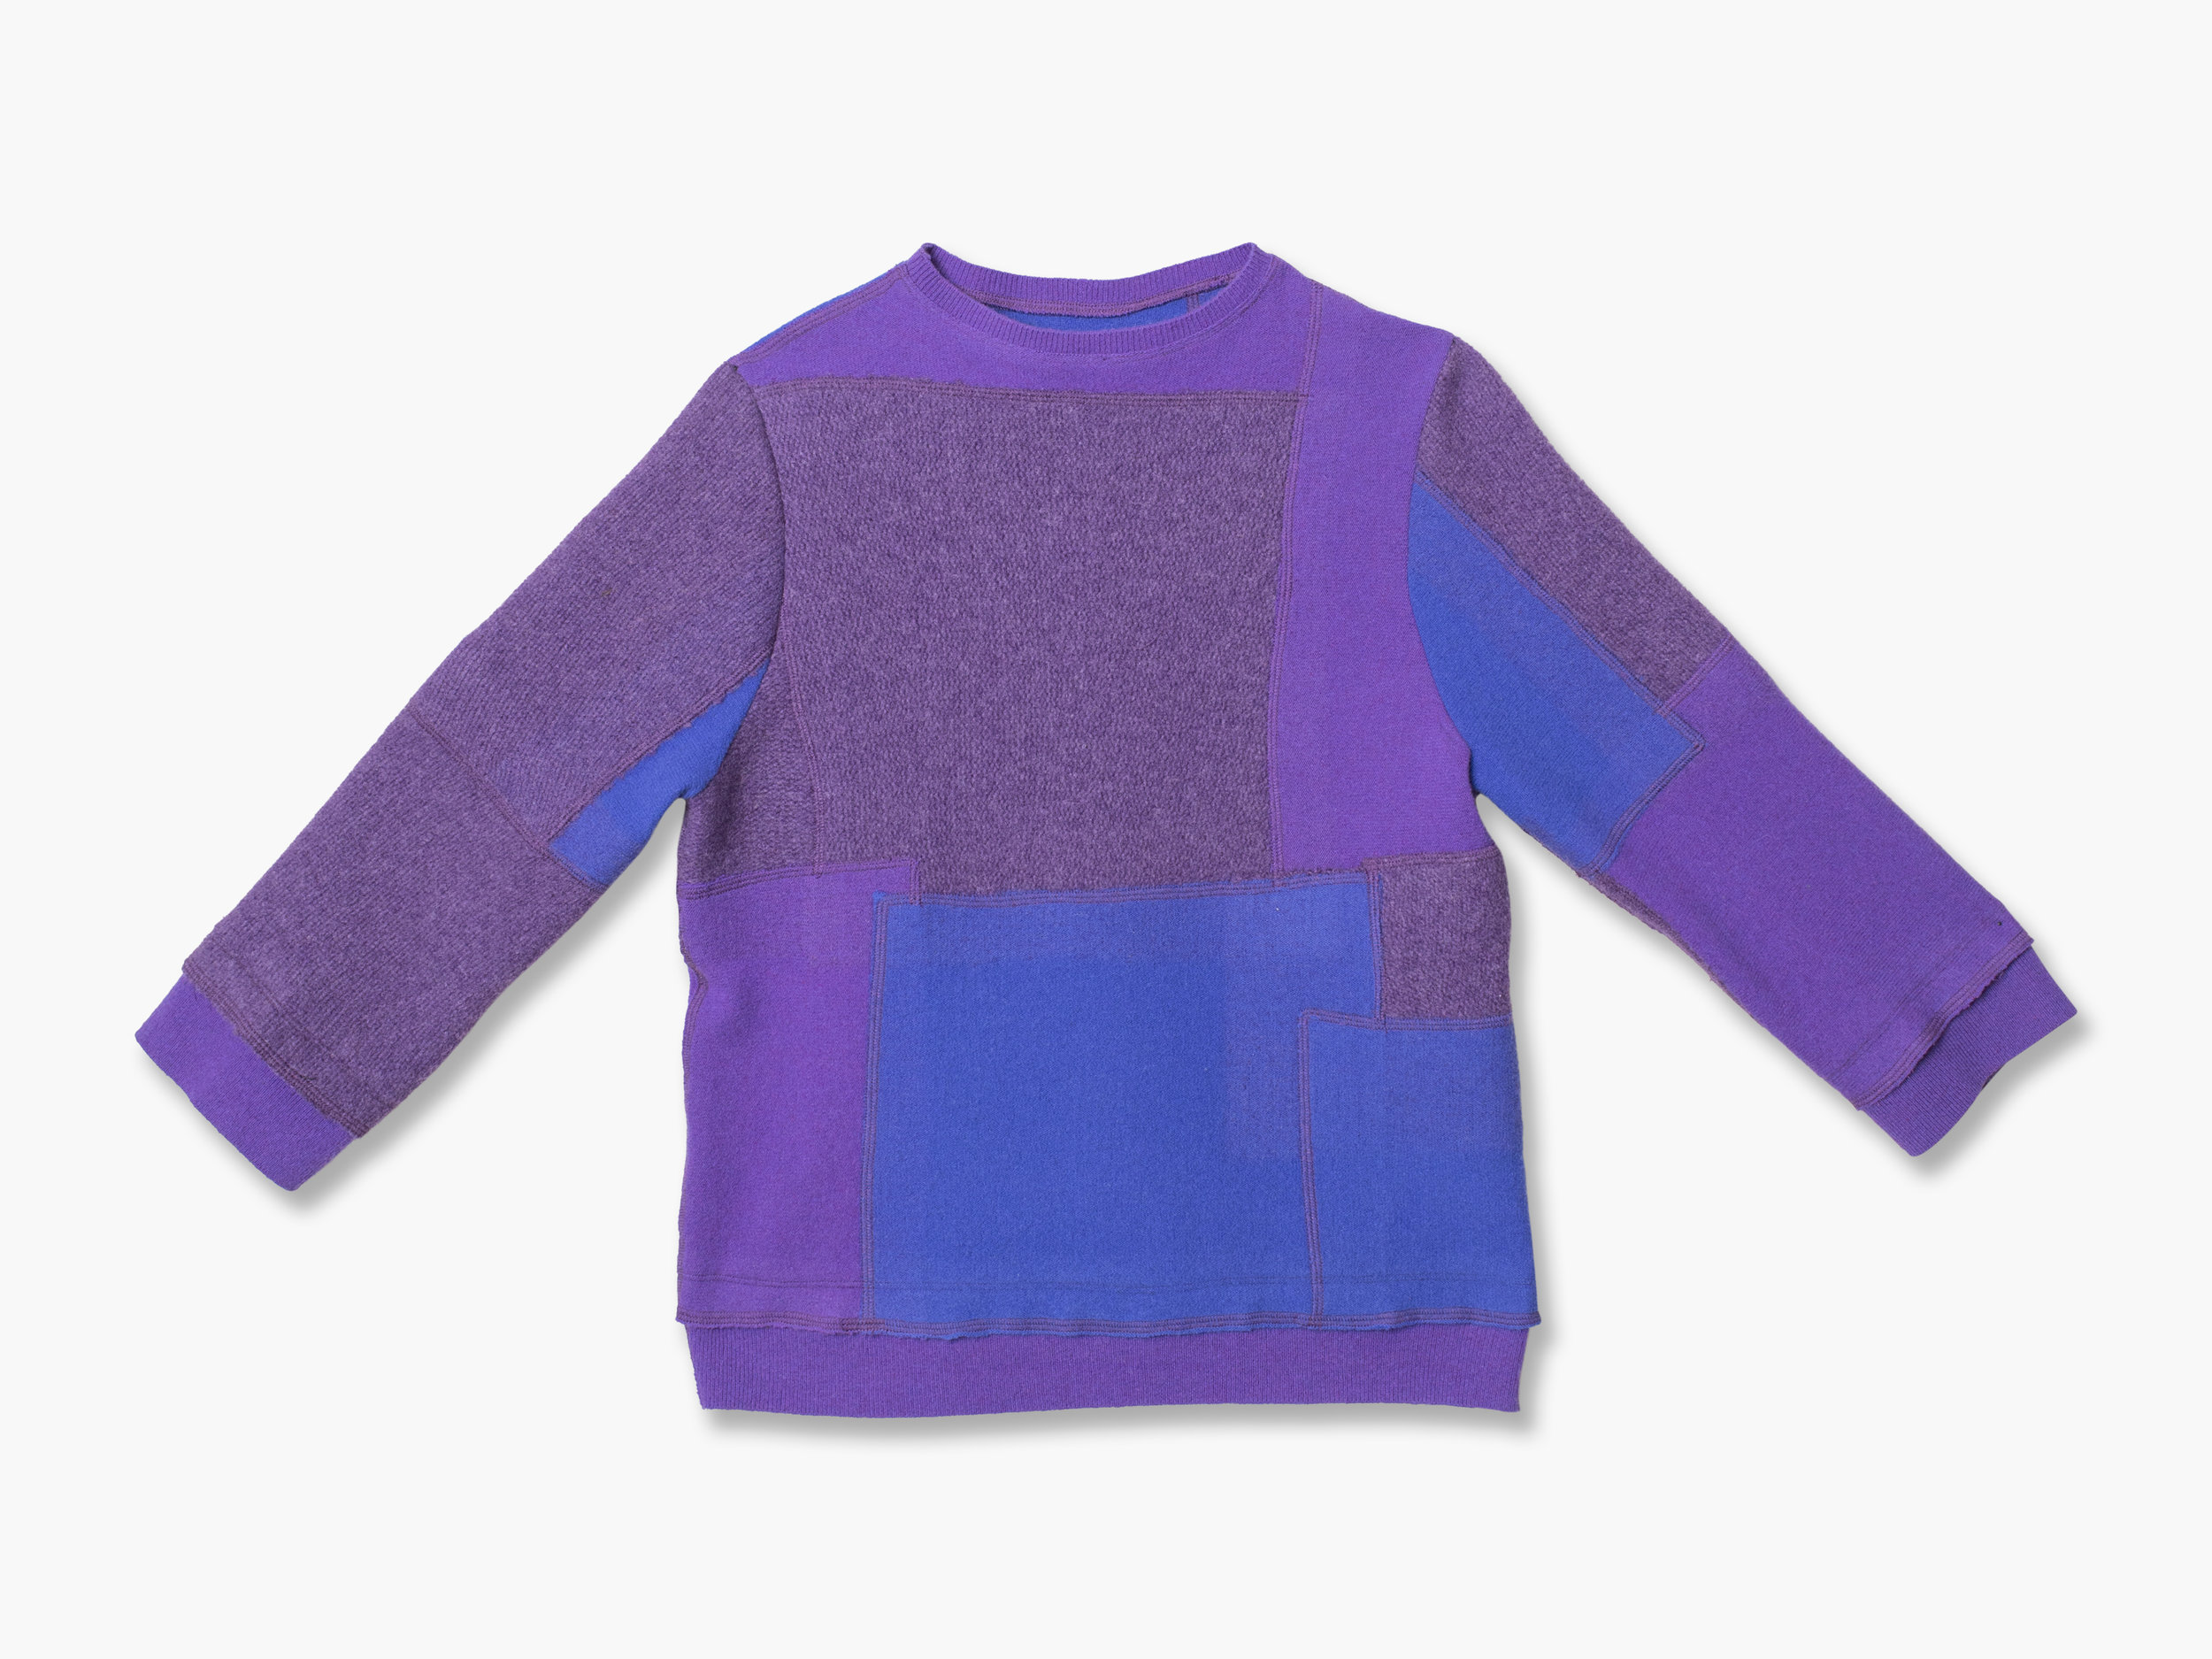 EF_Web_Lo_Garments_Sweater_1.jpg